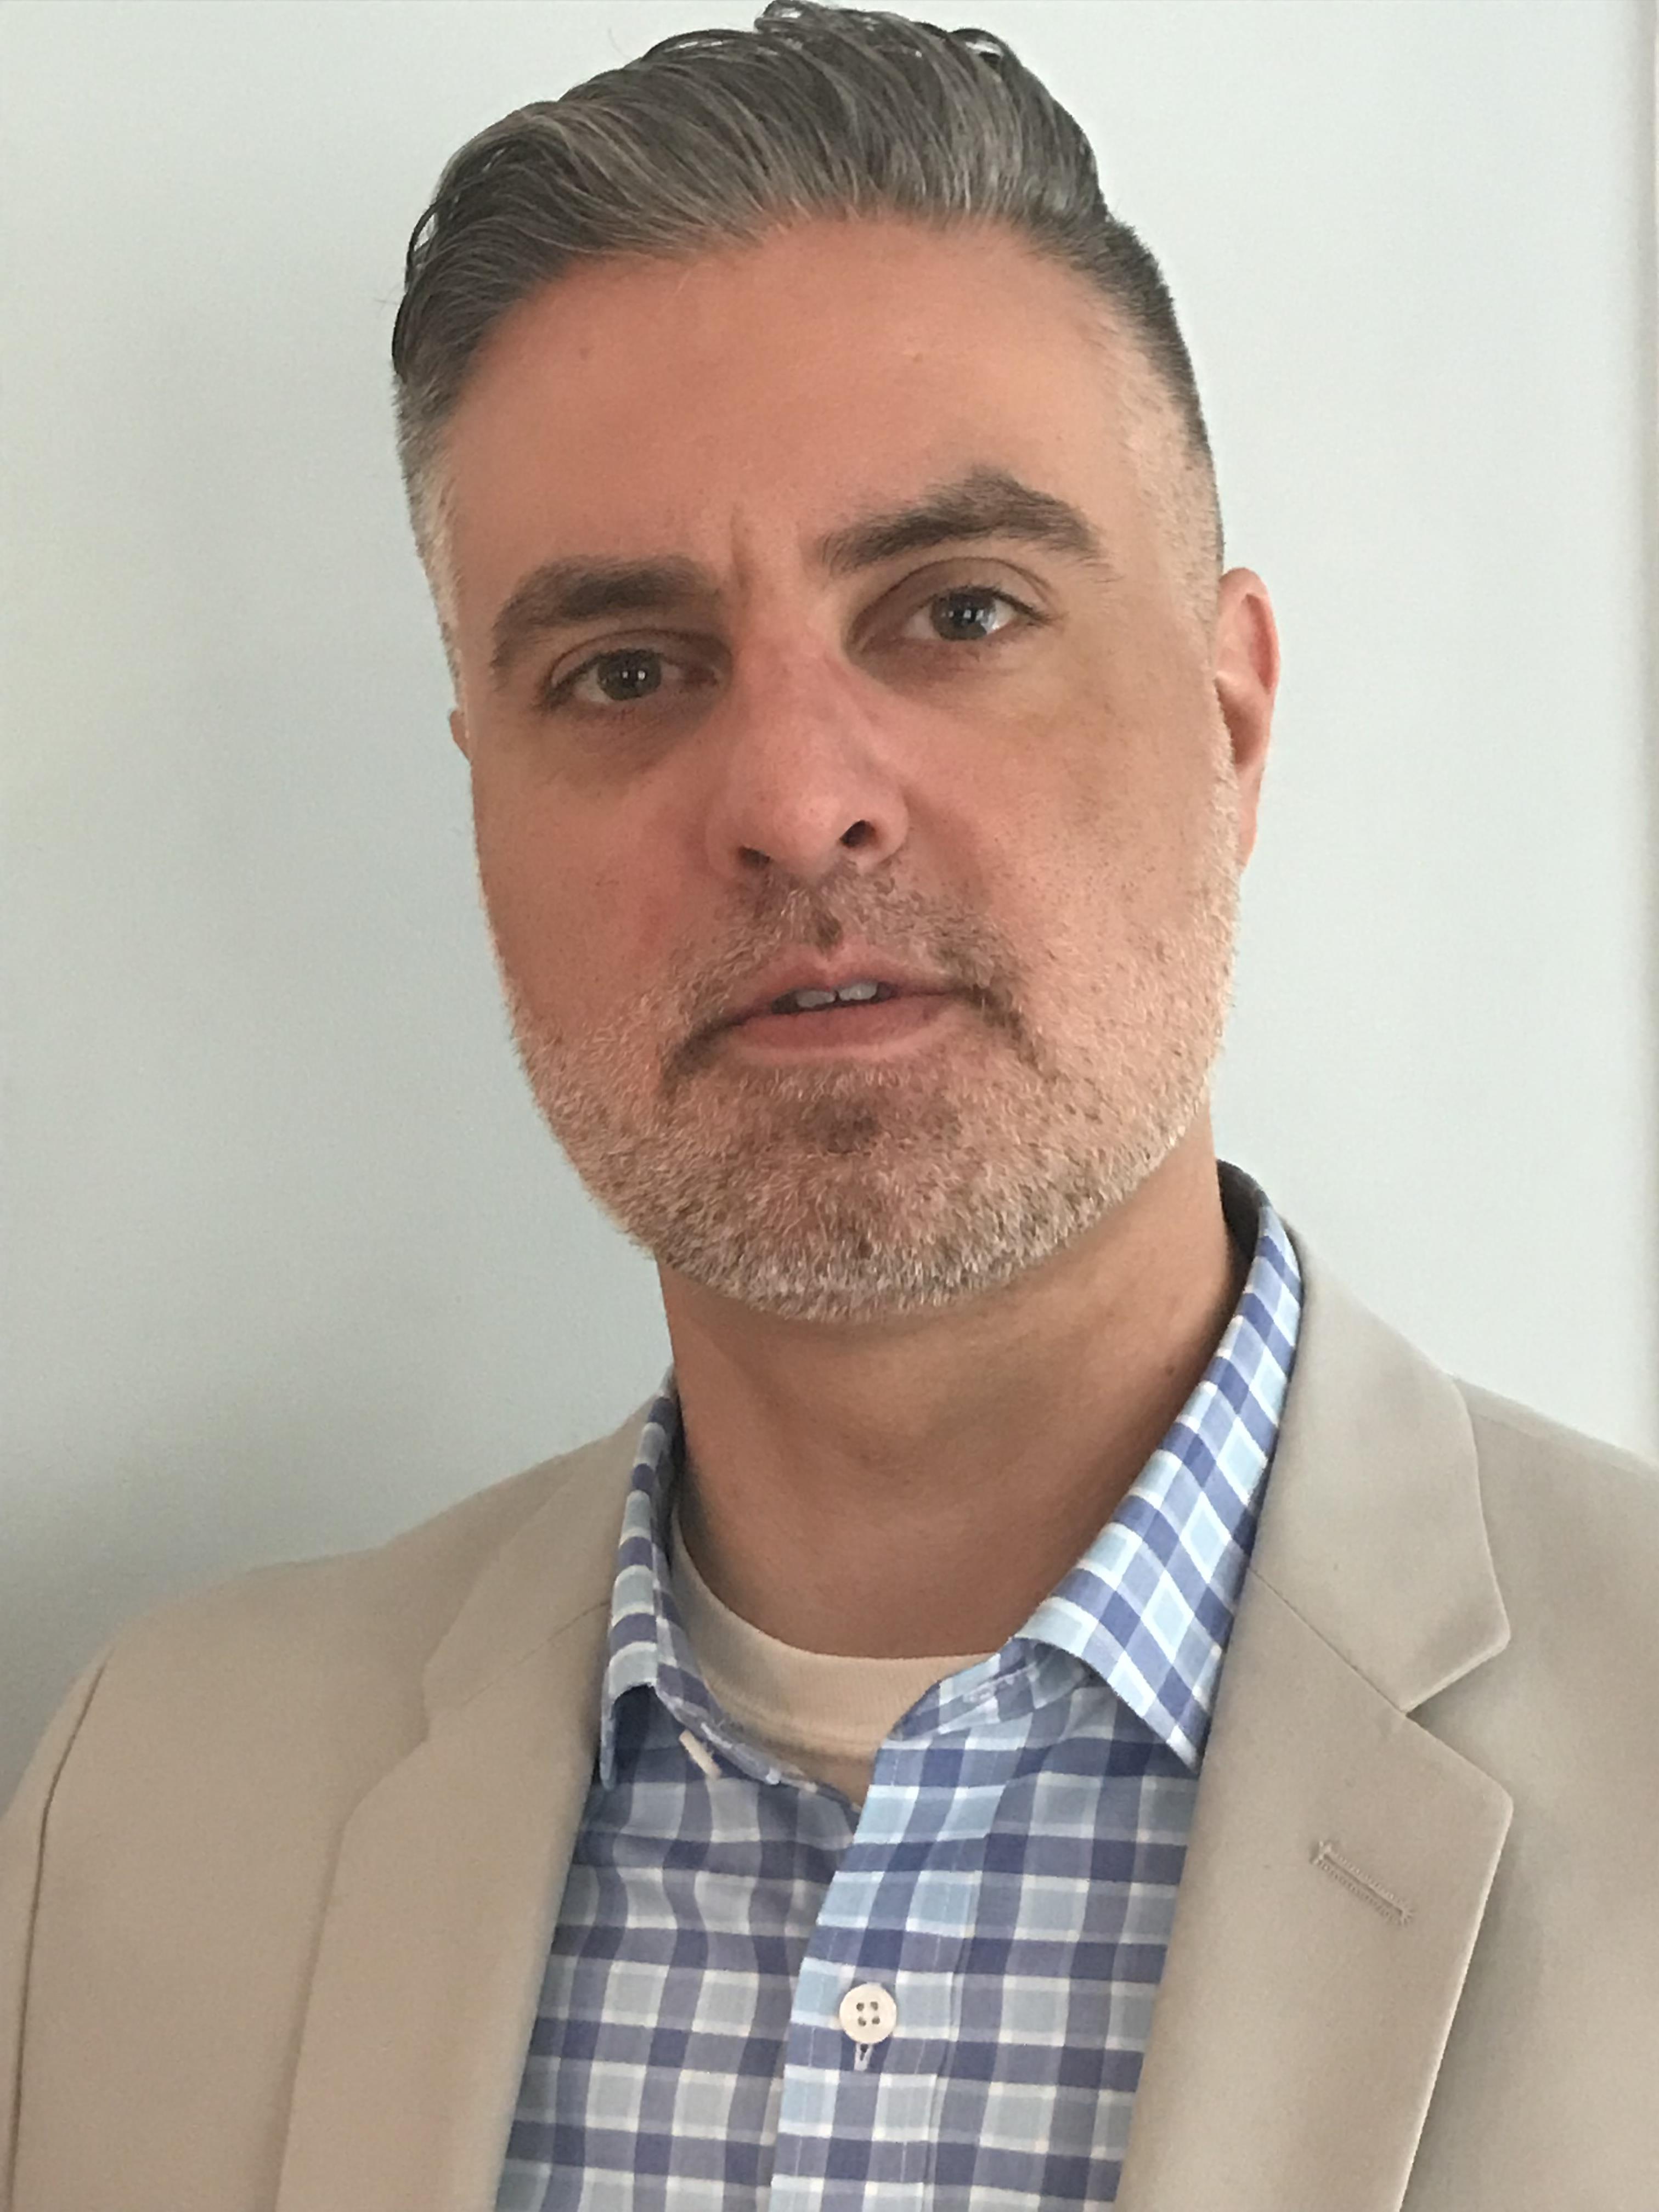 Carmine Langevin